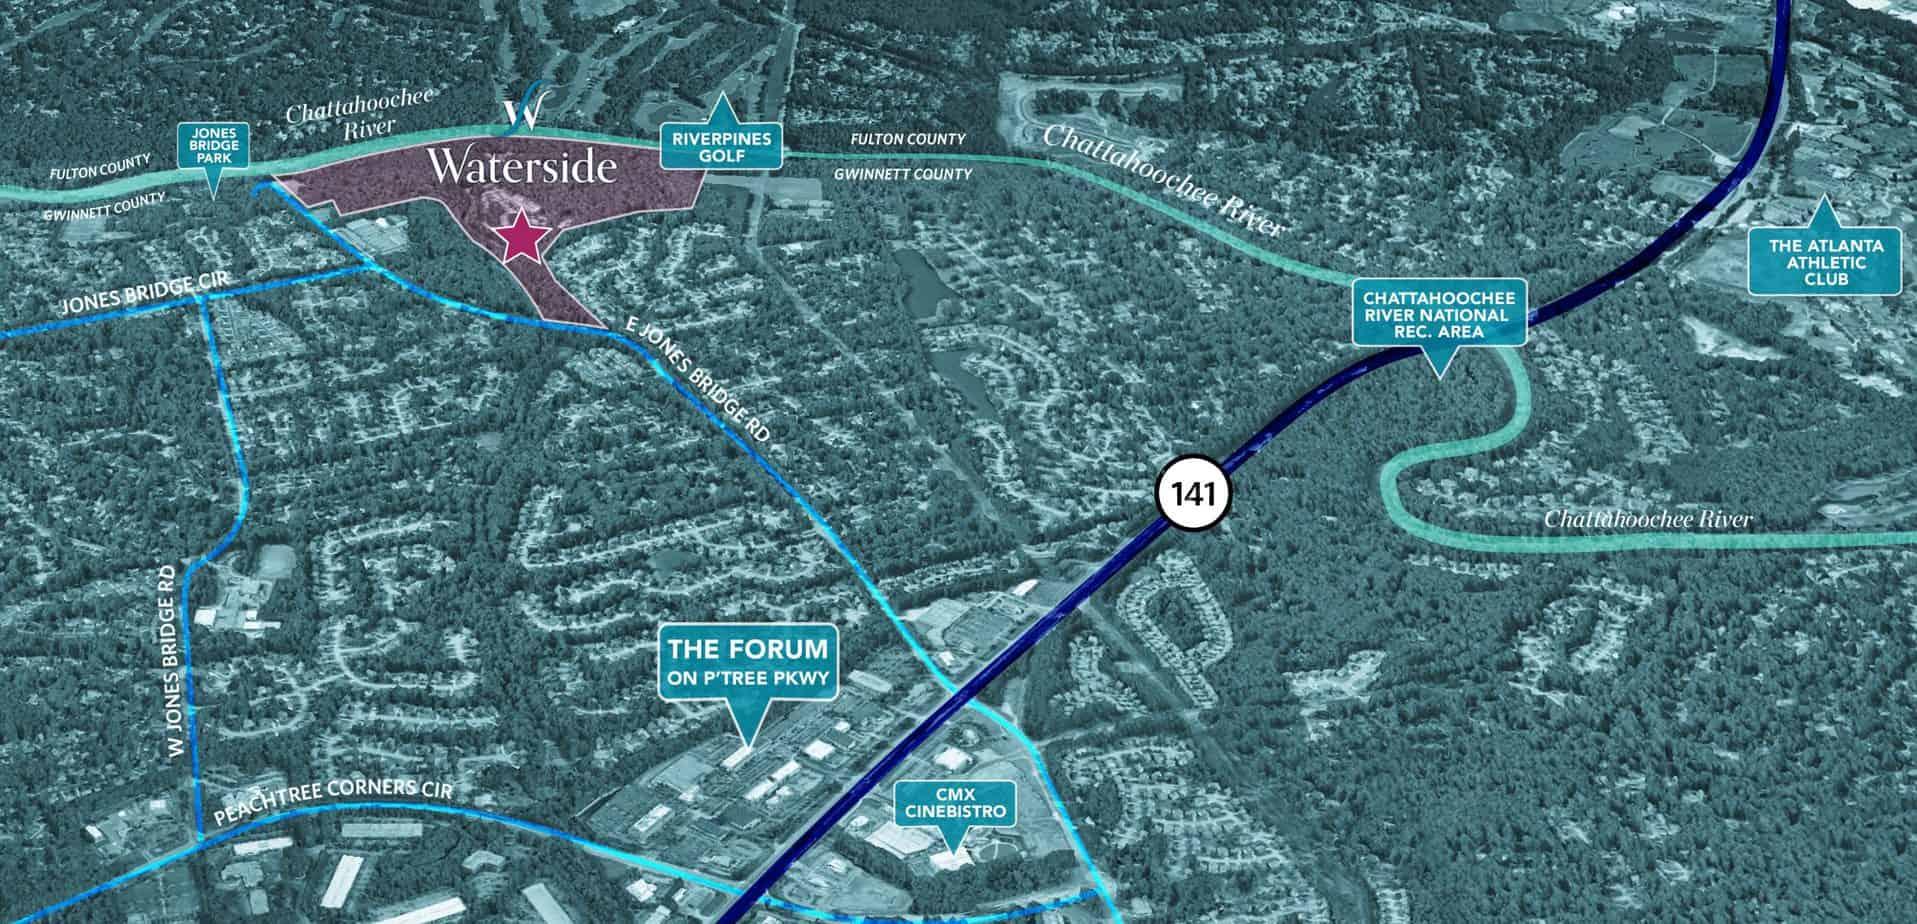 aerial map view of waterside in peachtree corners